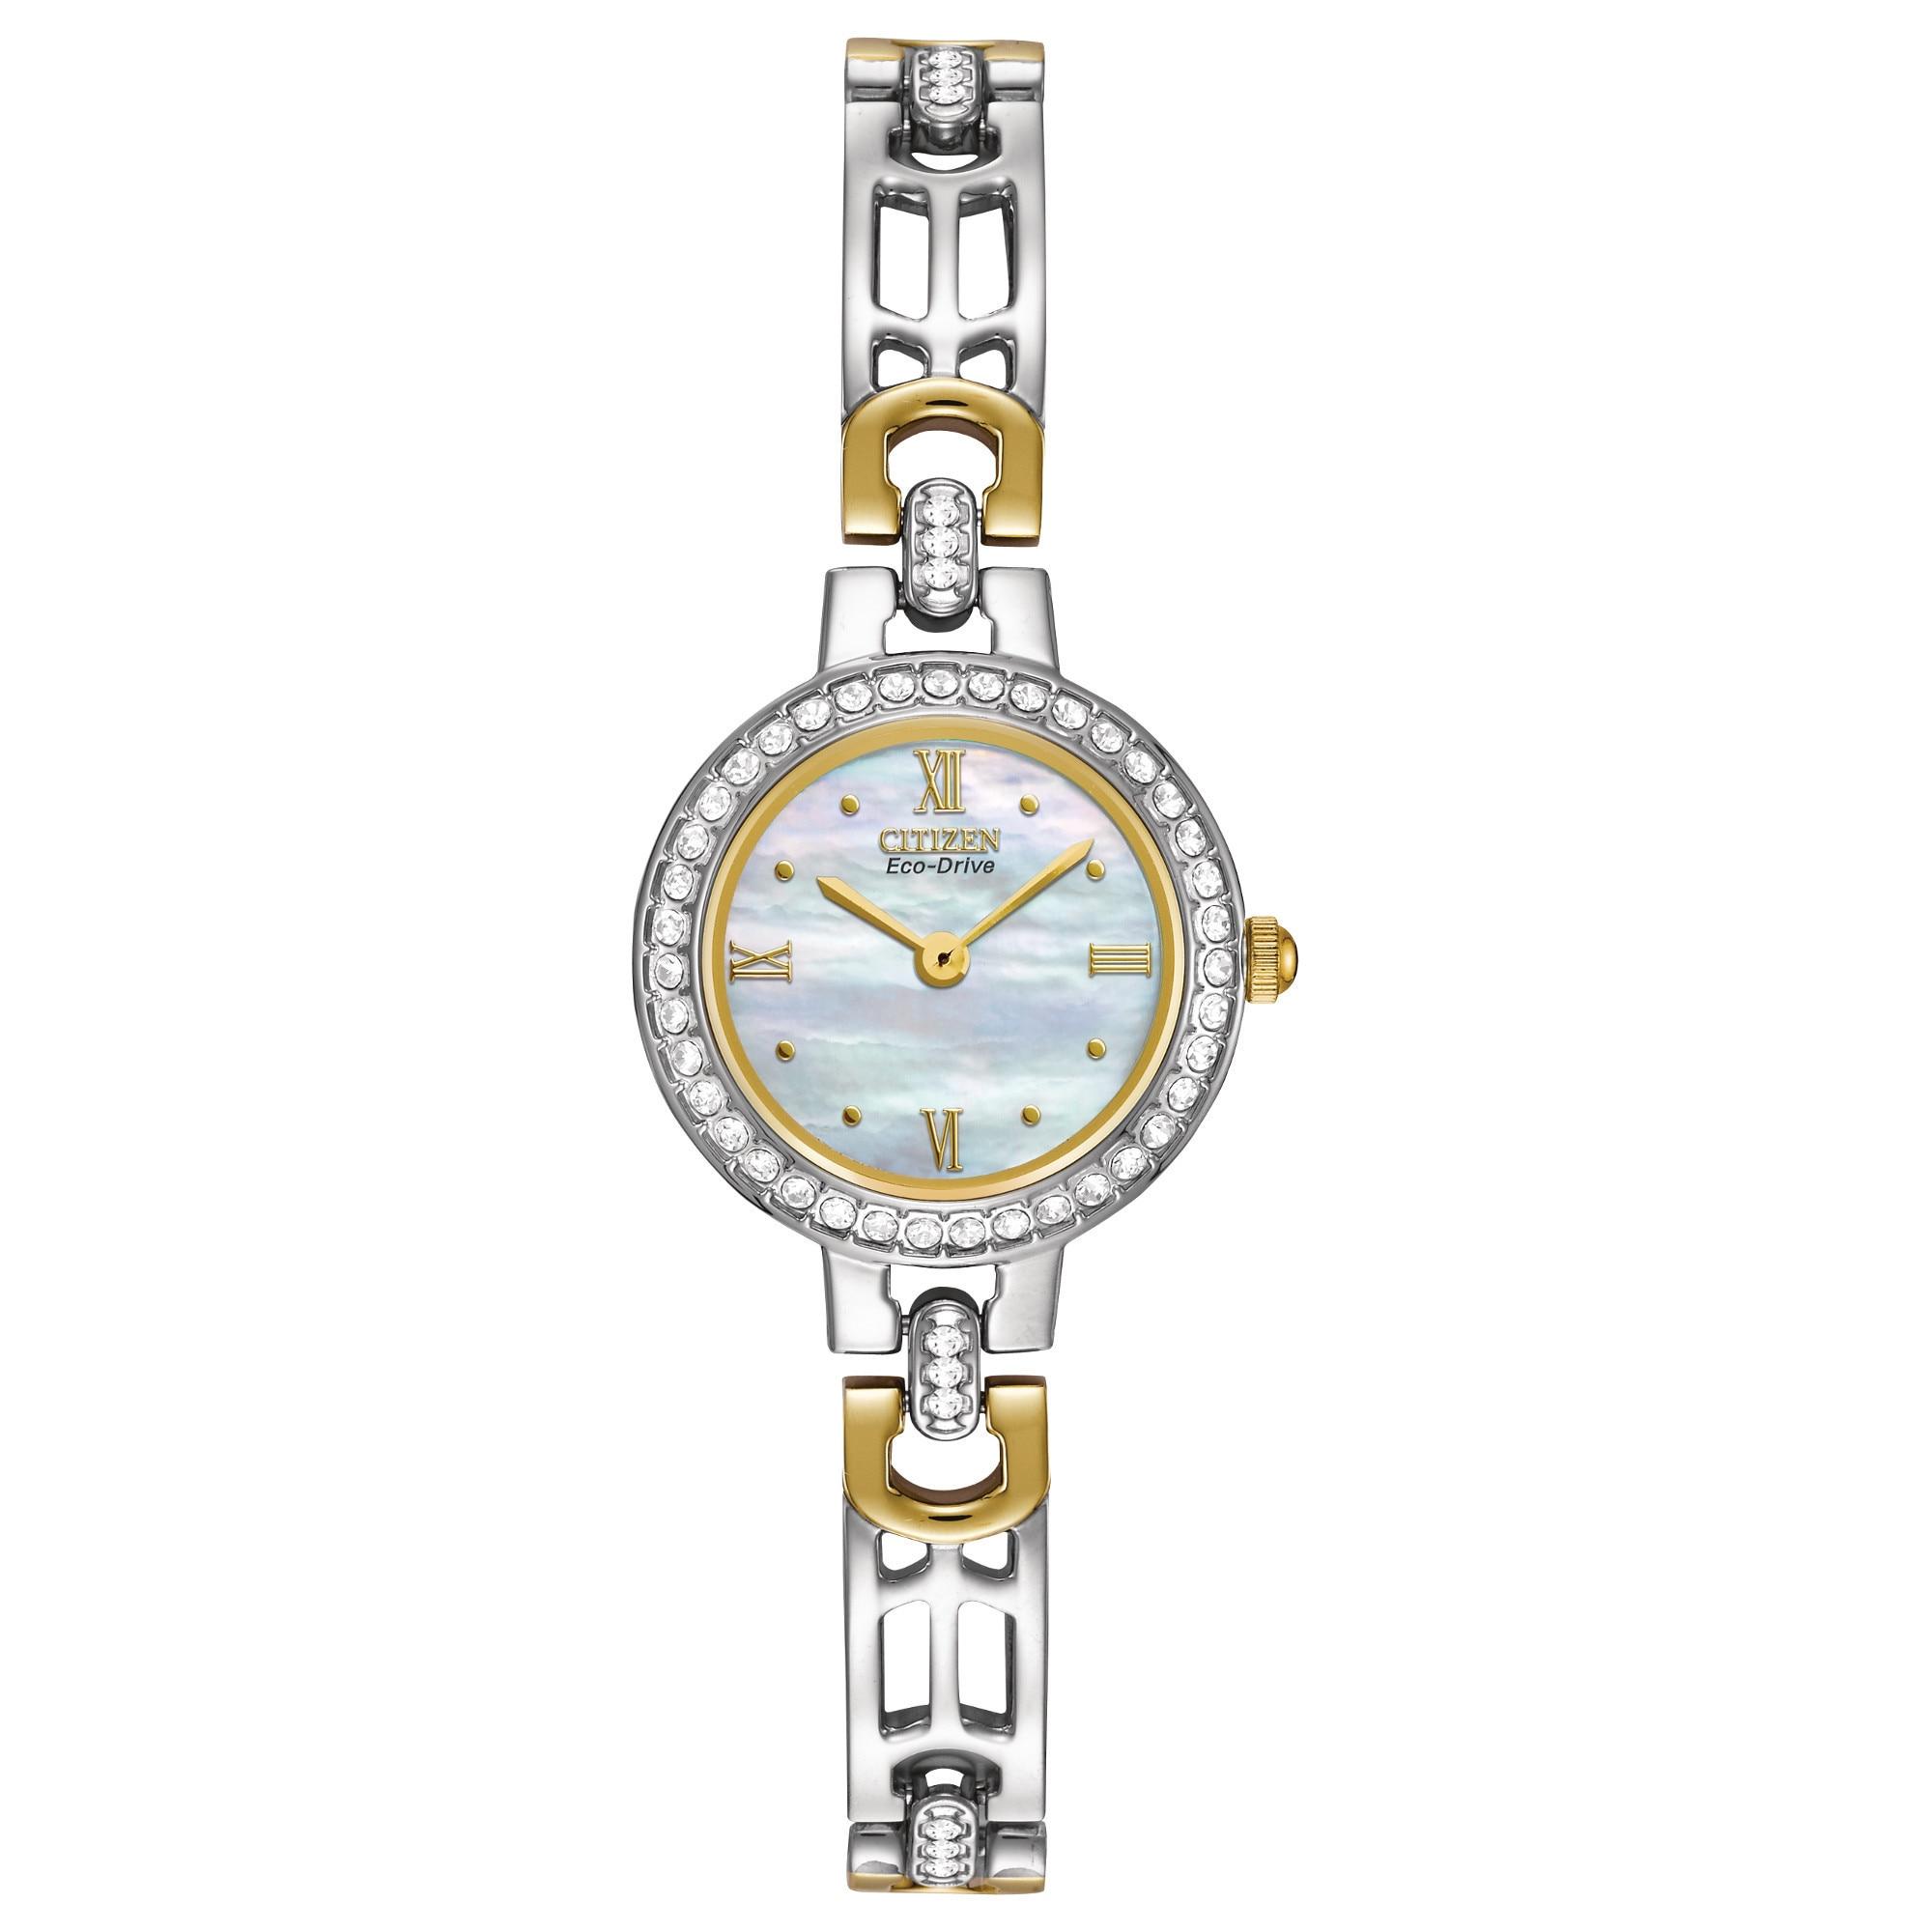 Citizen Women's EW8464-52D Eco-Drive Silhouette Watch (Th...